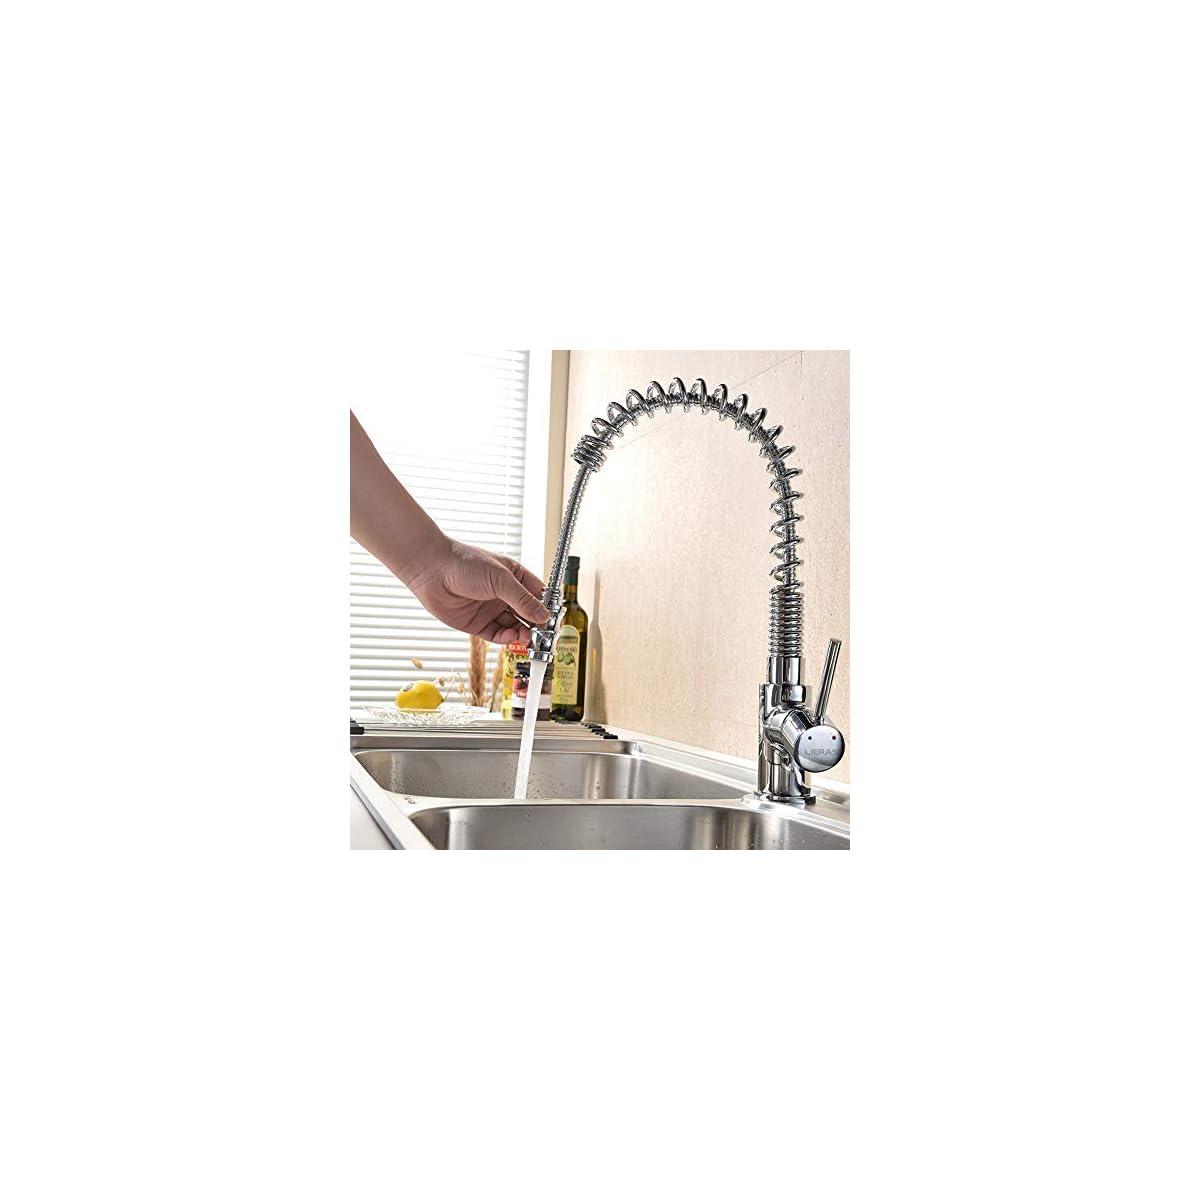 51L7x6HZG8L. SS1200  - LIERAS Grifos de cocina Girar Primavera Canalon Extraer Chrome Pulido Mezclador de bar grifos lavabos,monomando grifo del fregadero de la cocina